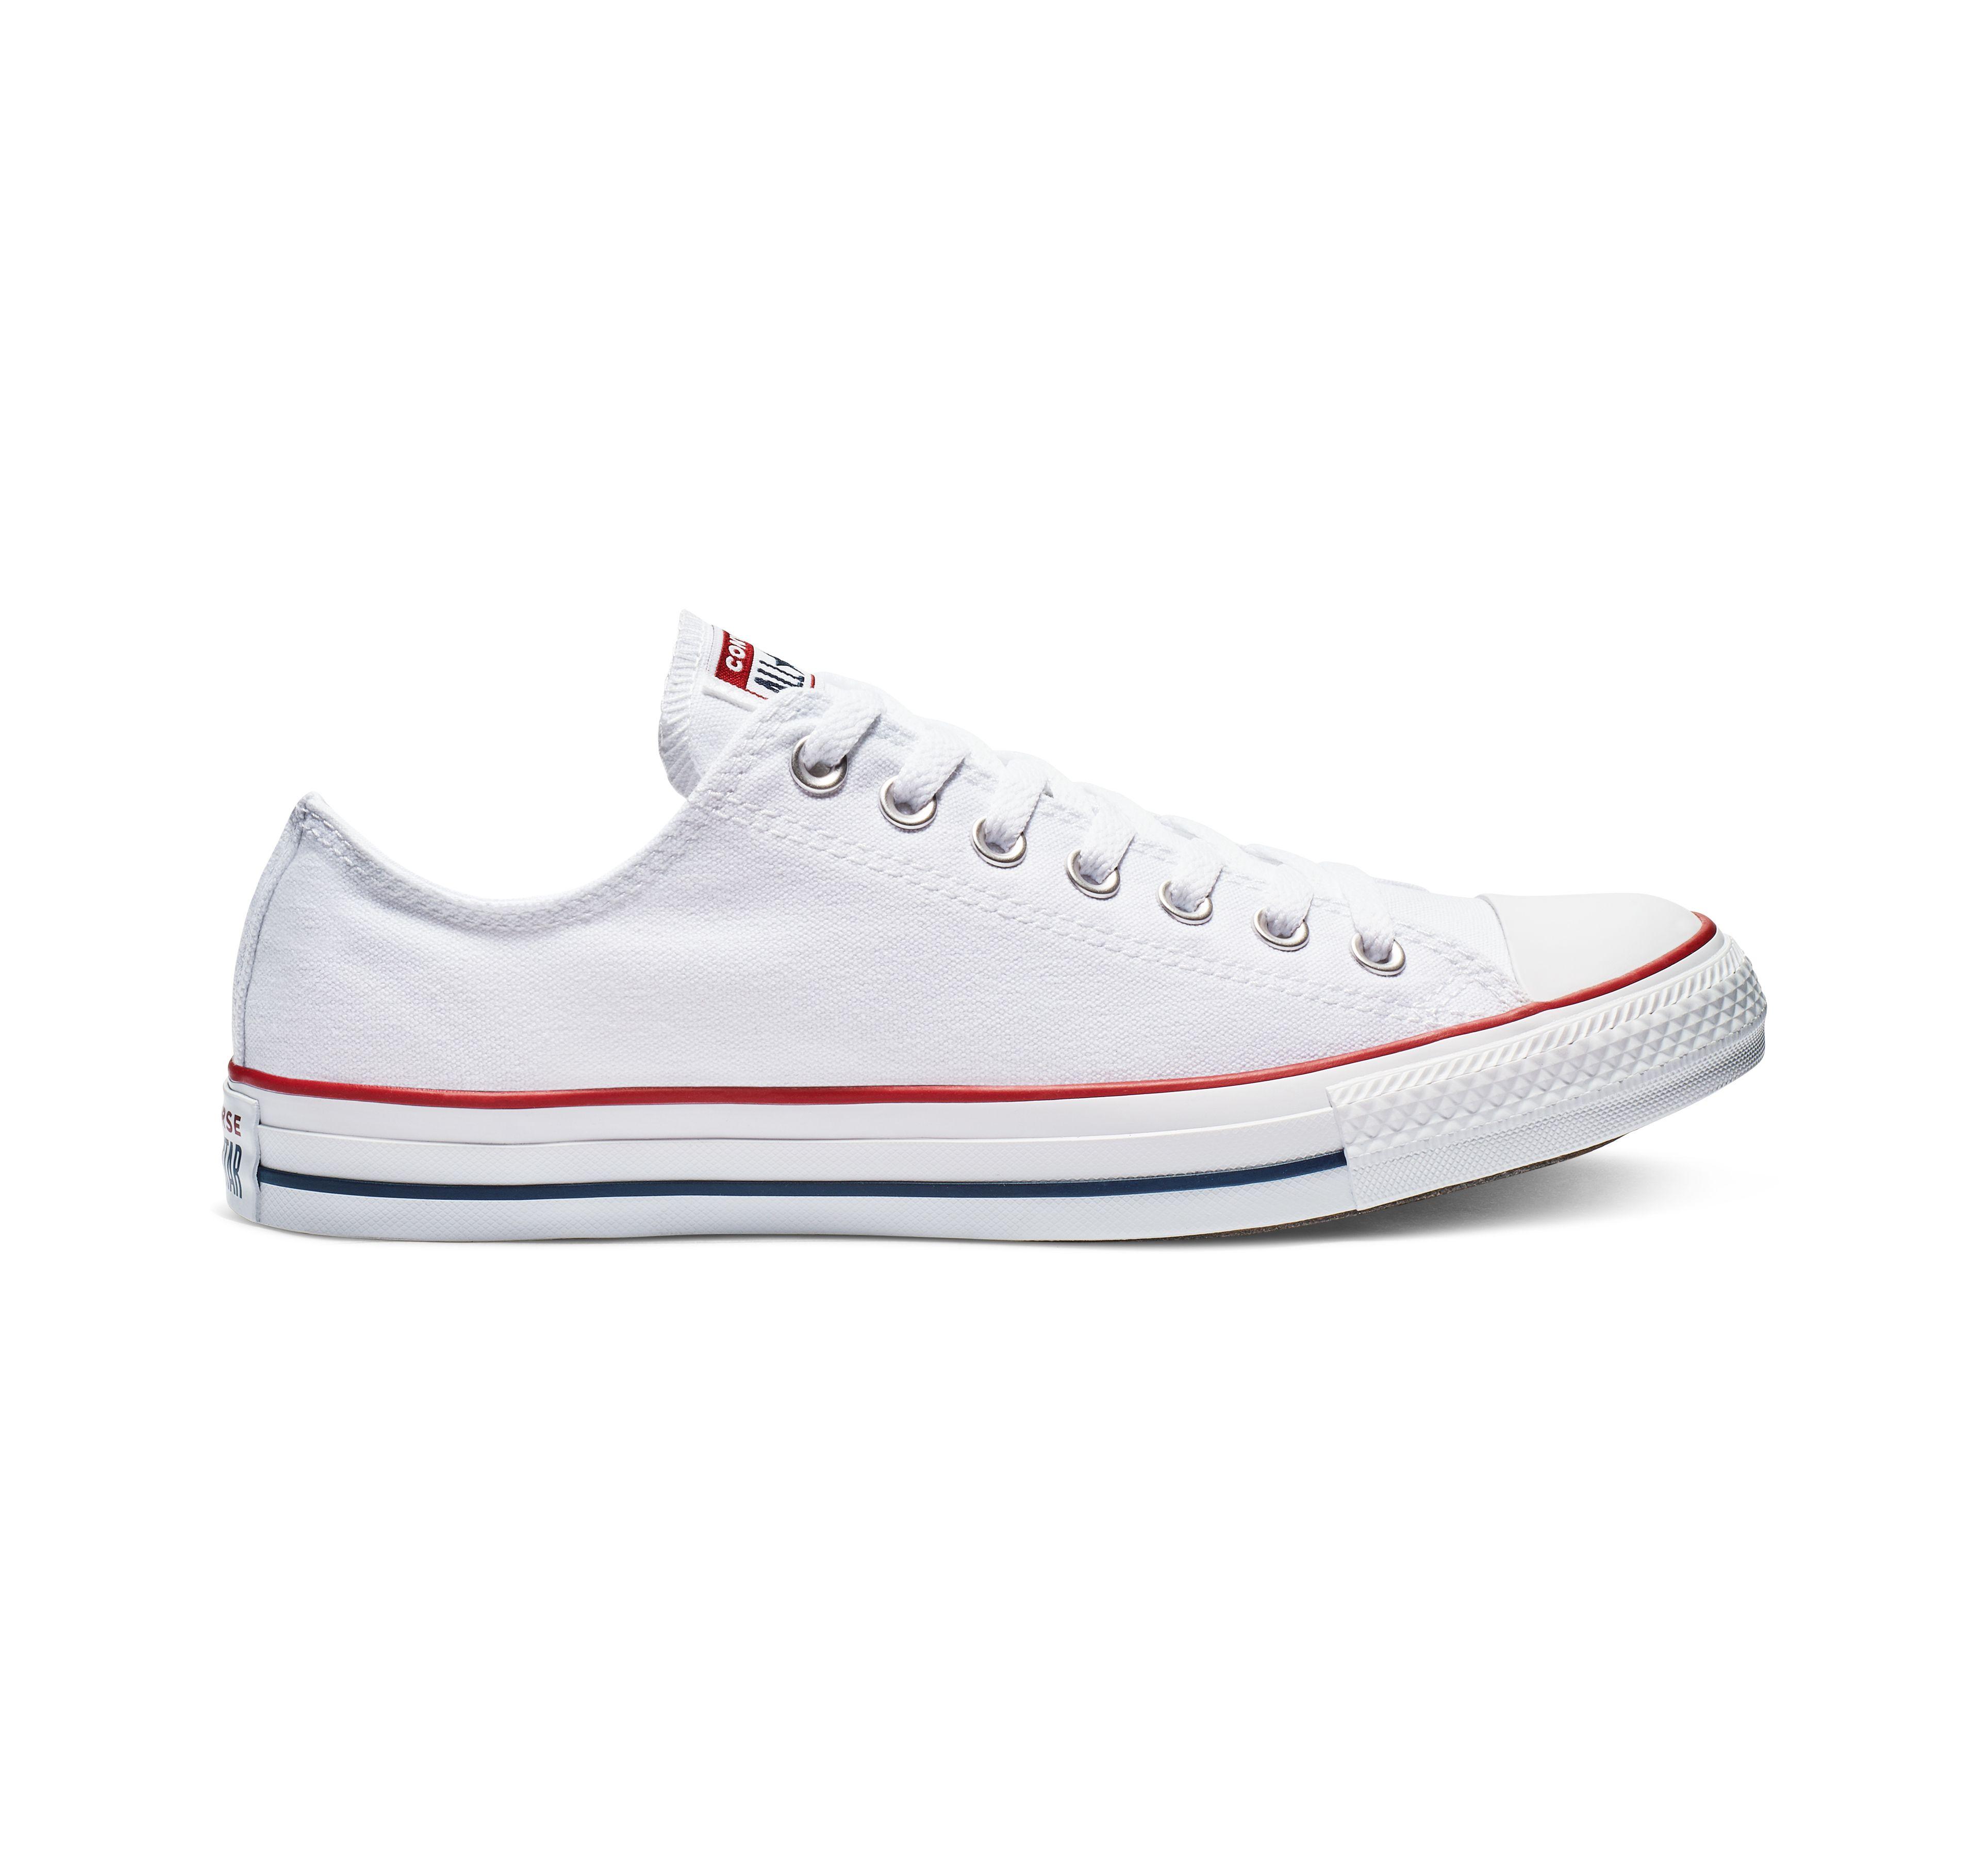 Buy�Converse Men Shoes�Online |�lazada.sg